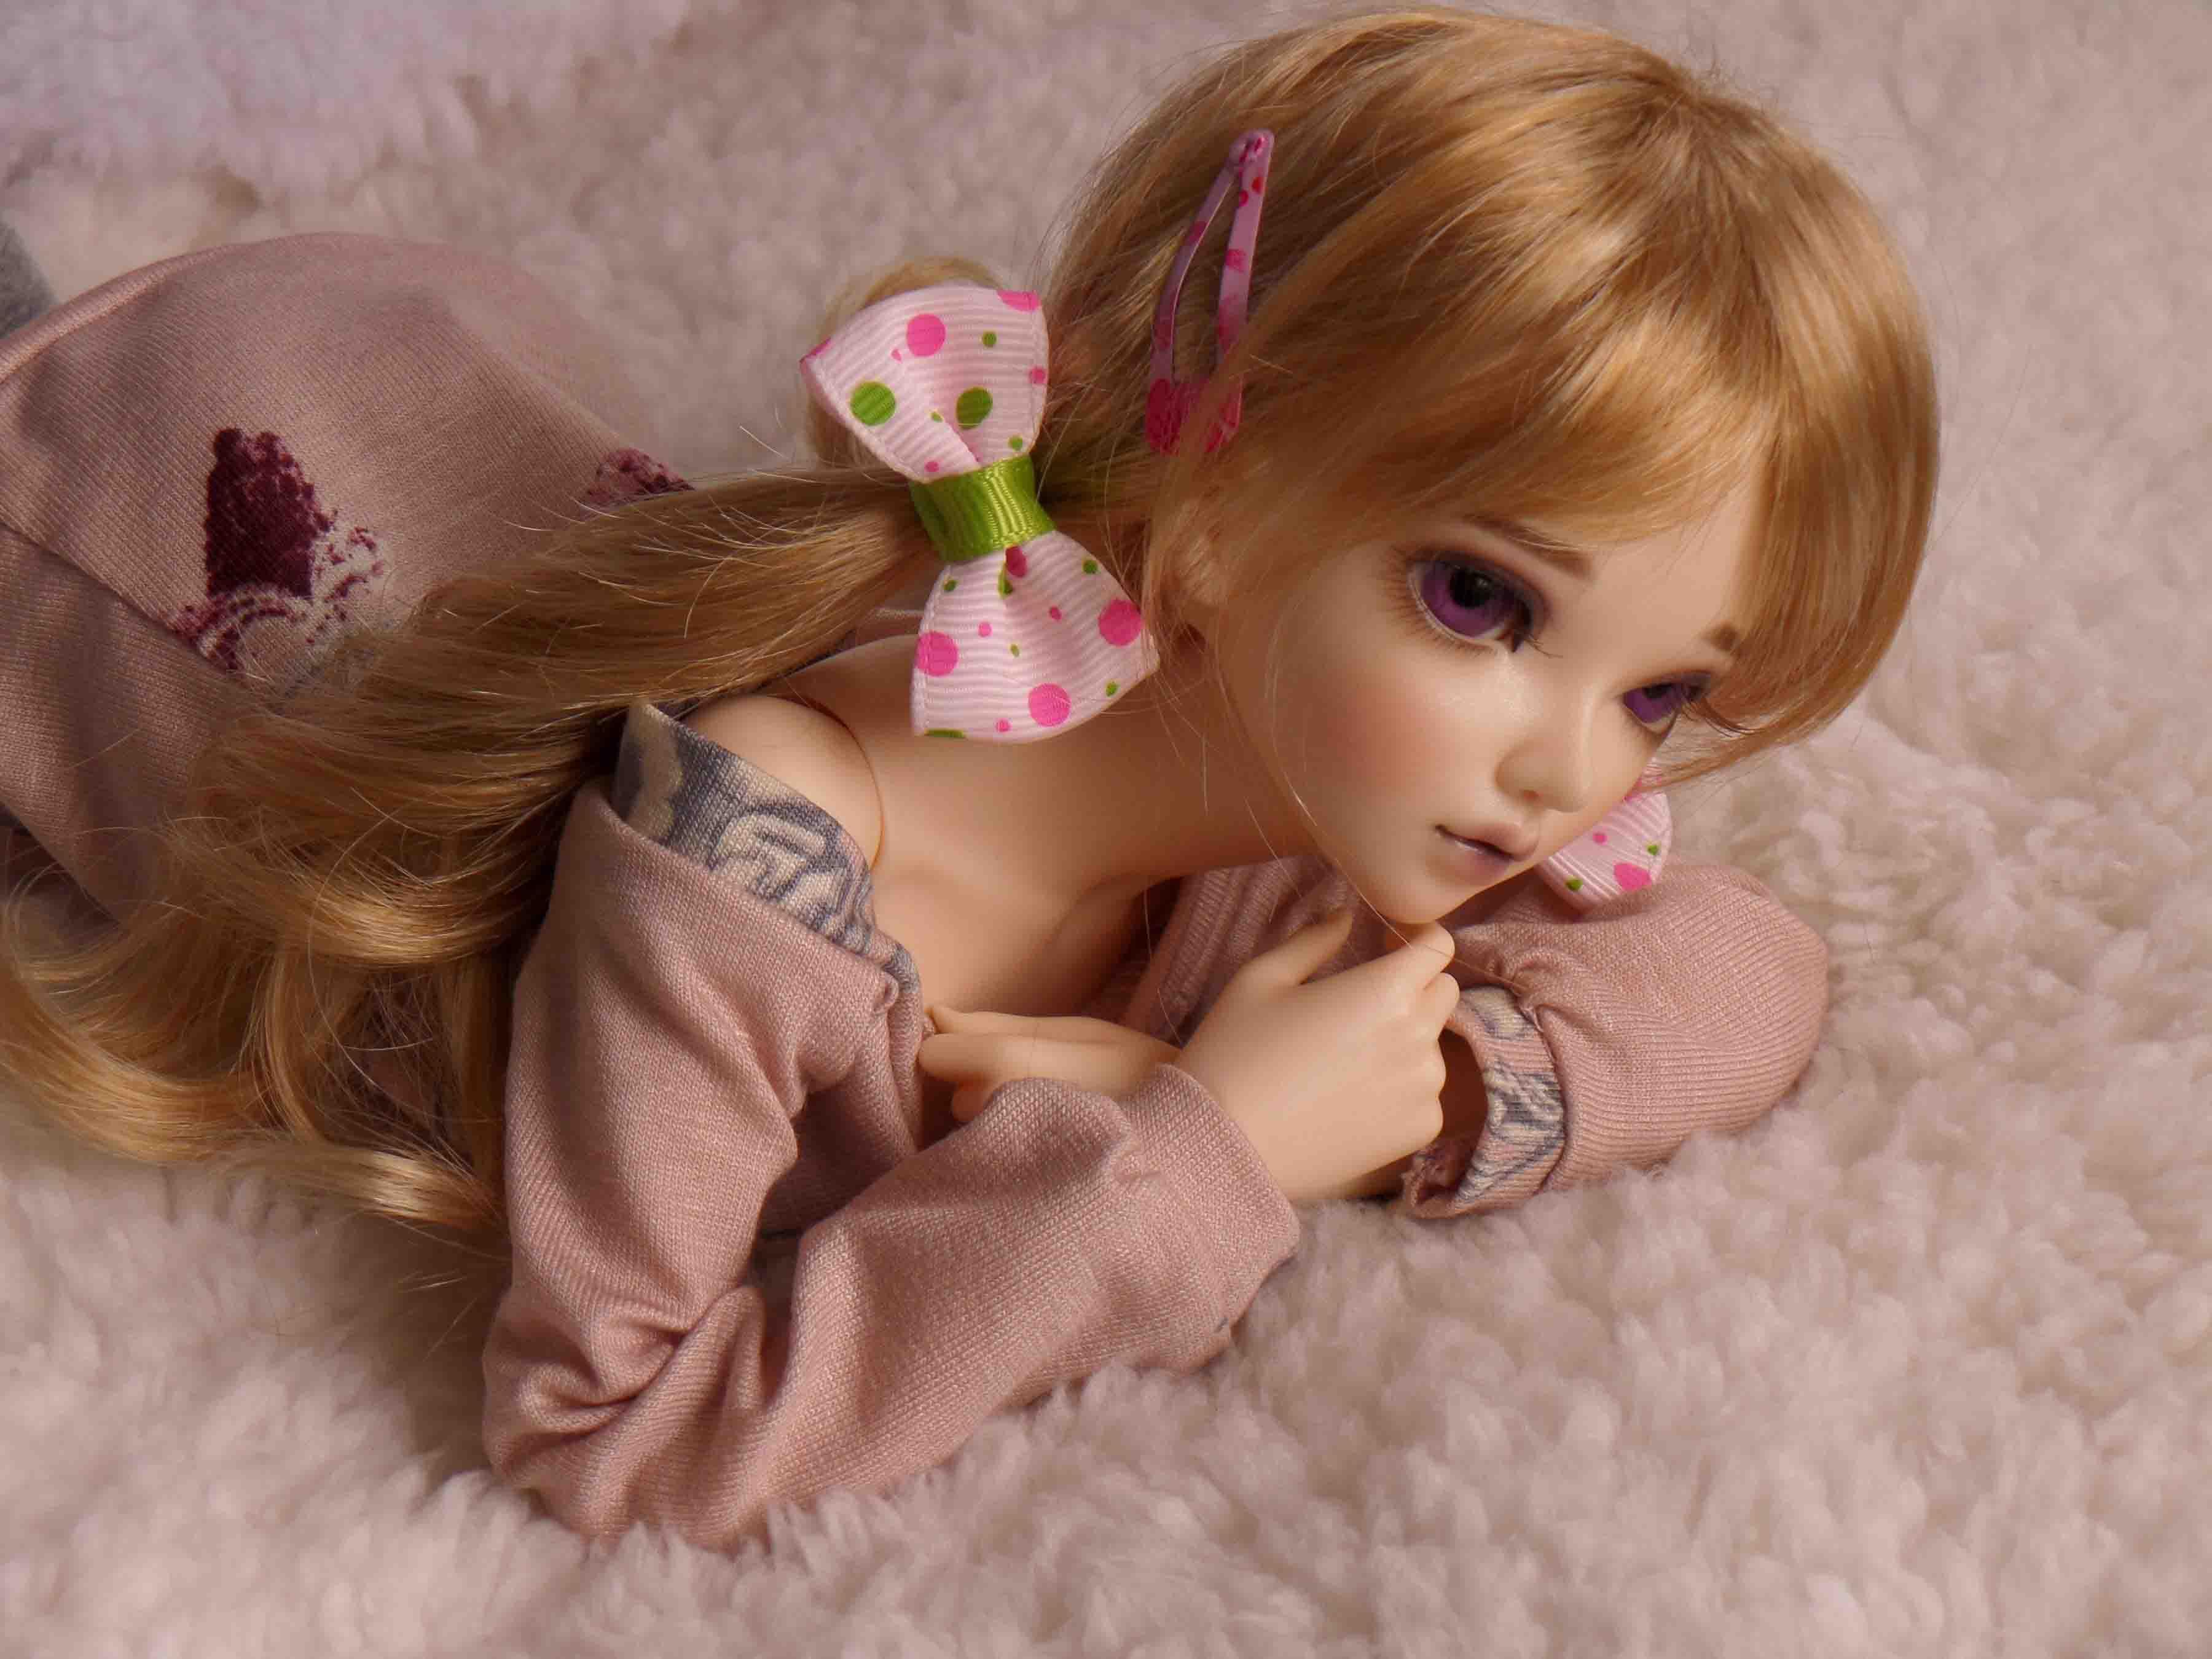 Cute Barbie Dolls HD Wallpapers 3600x2700